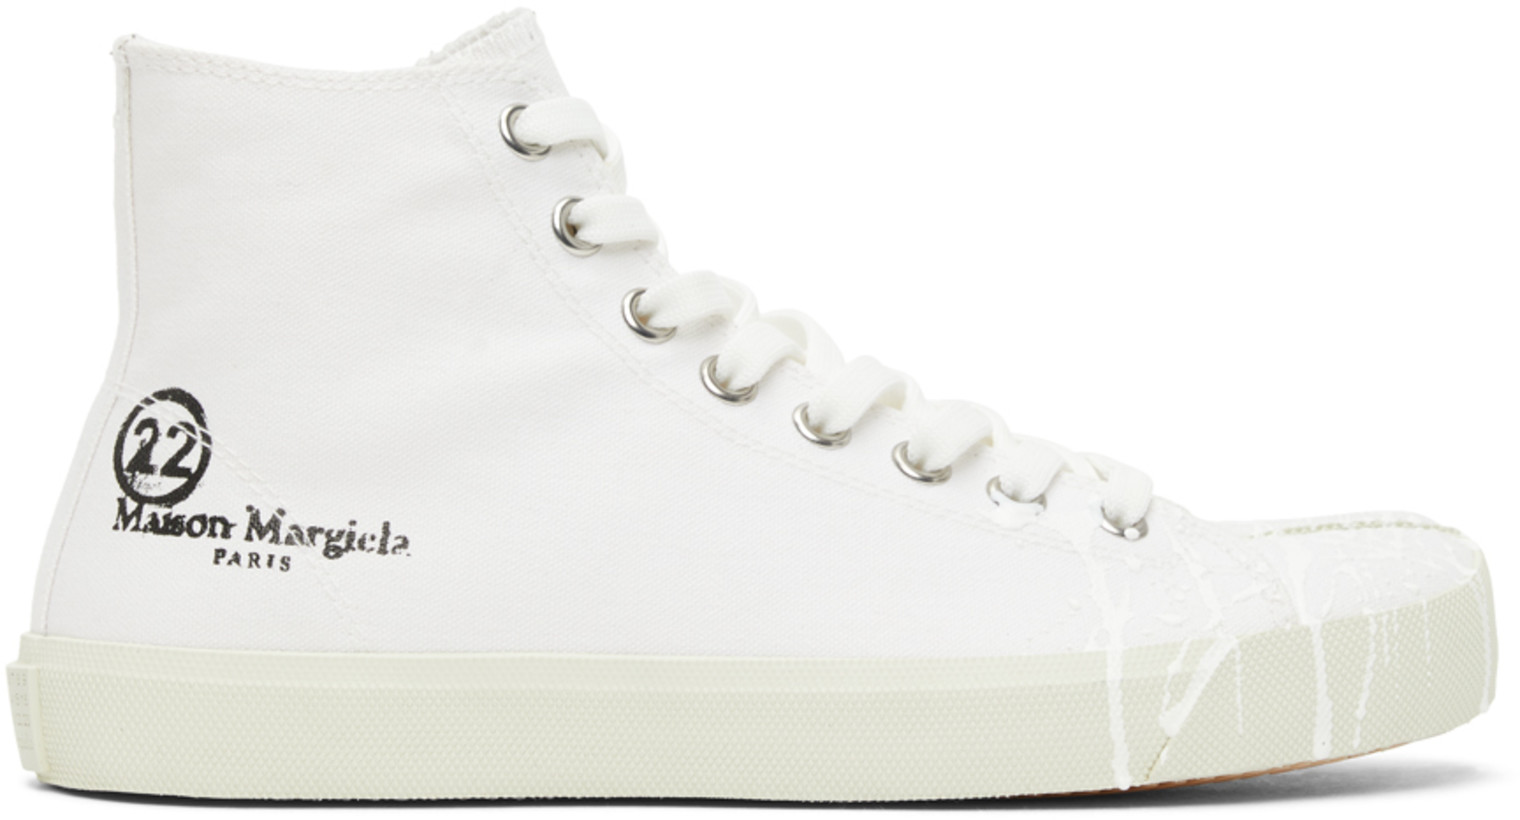 Maison Margiela White Canvas Pollock Tabi High-Top Sneakers